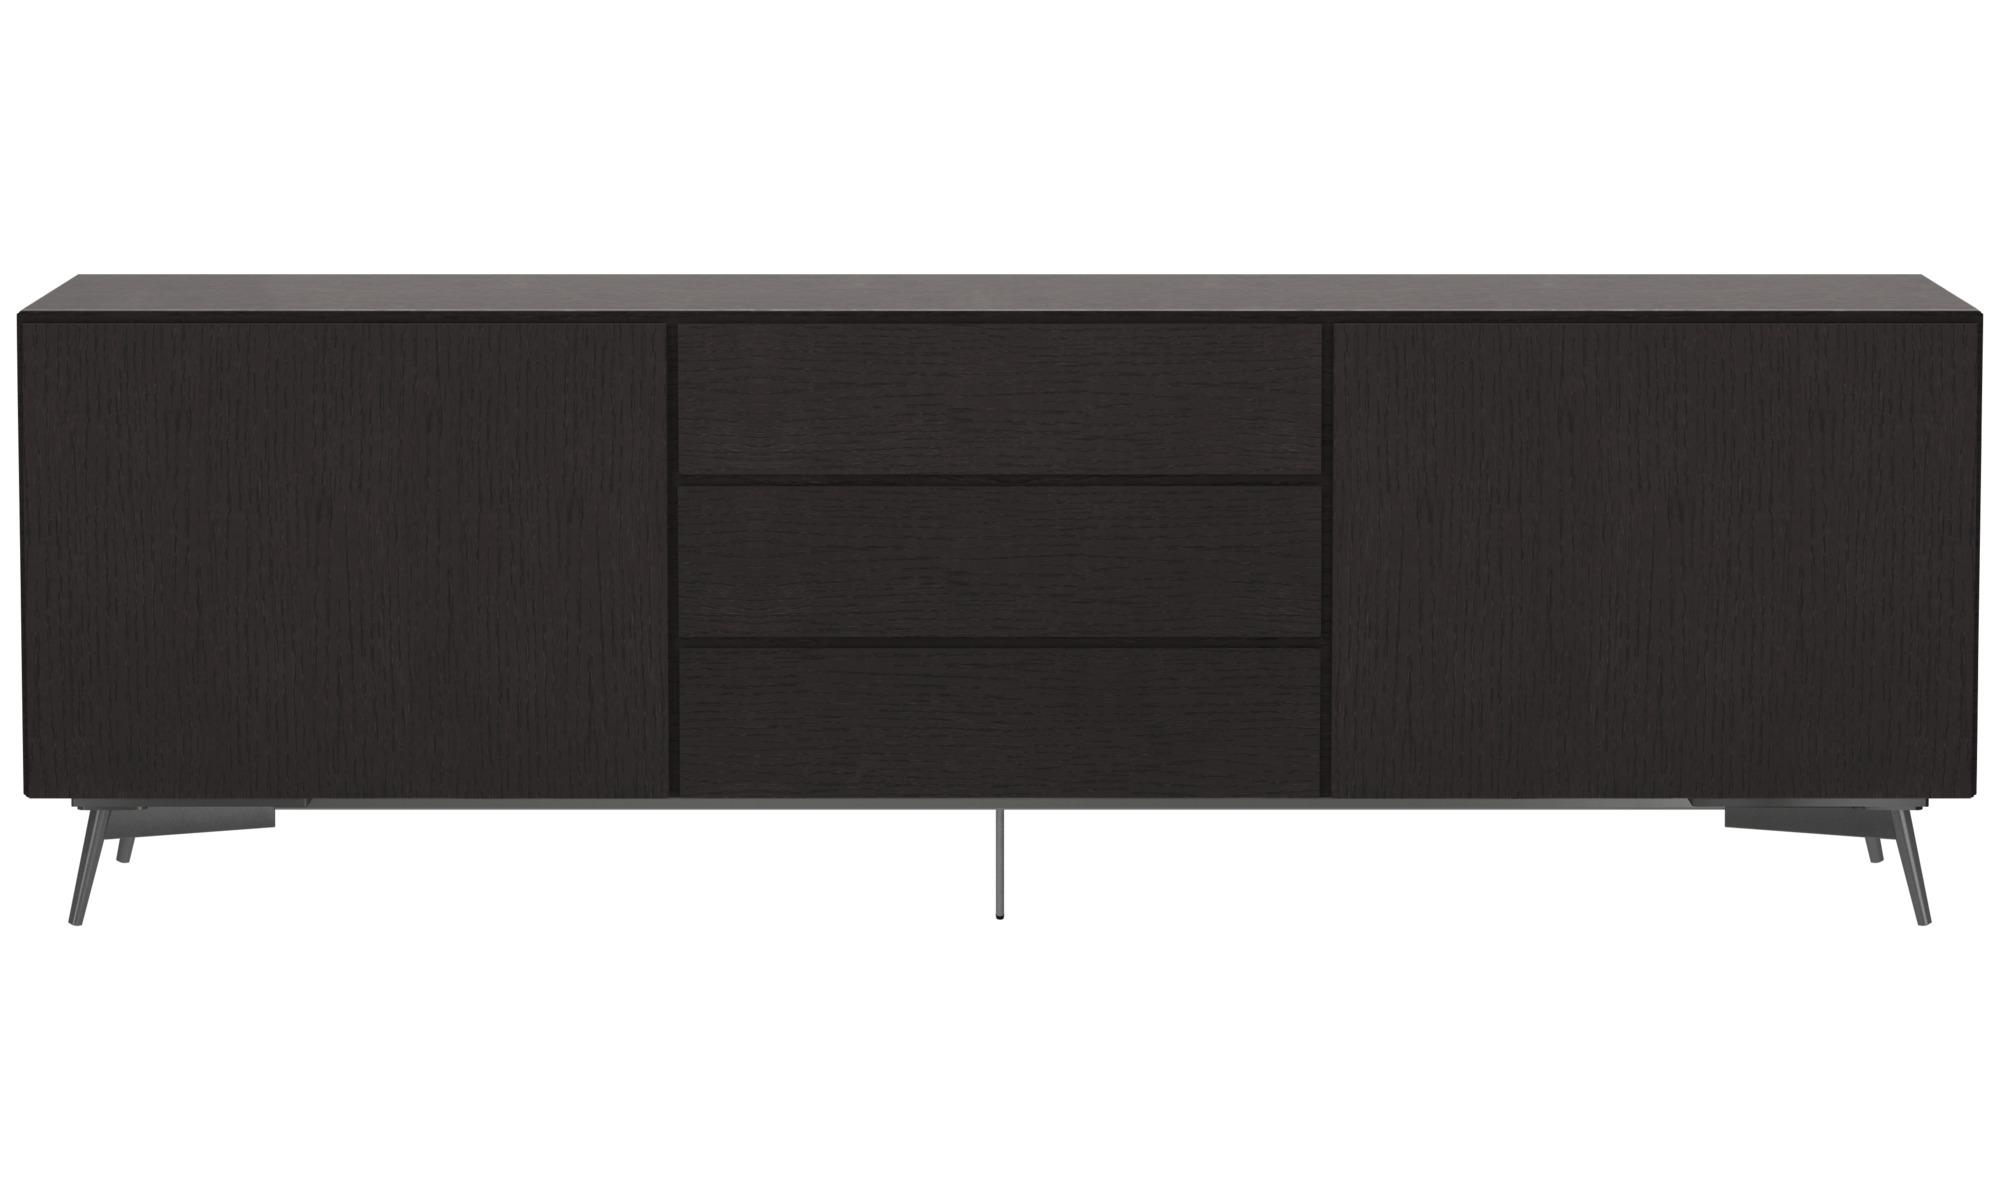 Sideboards - Lugano sideboard - Black - Oak